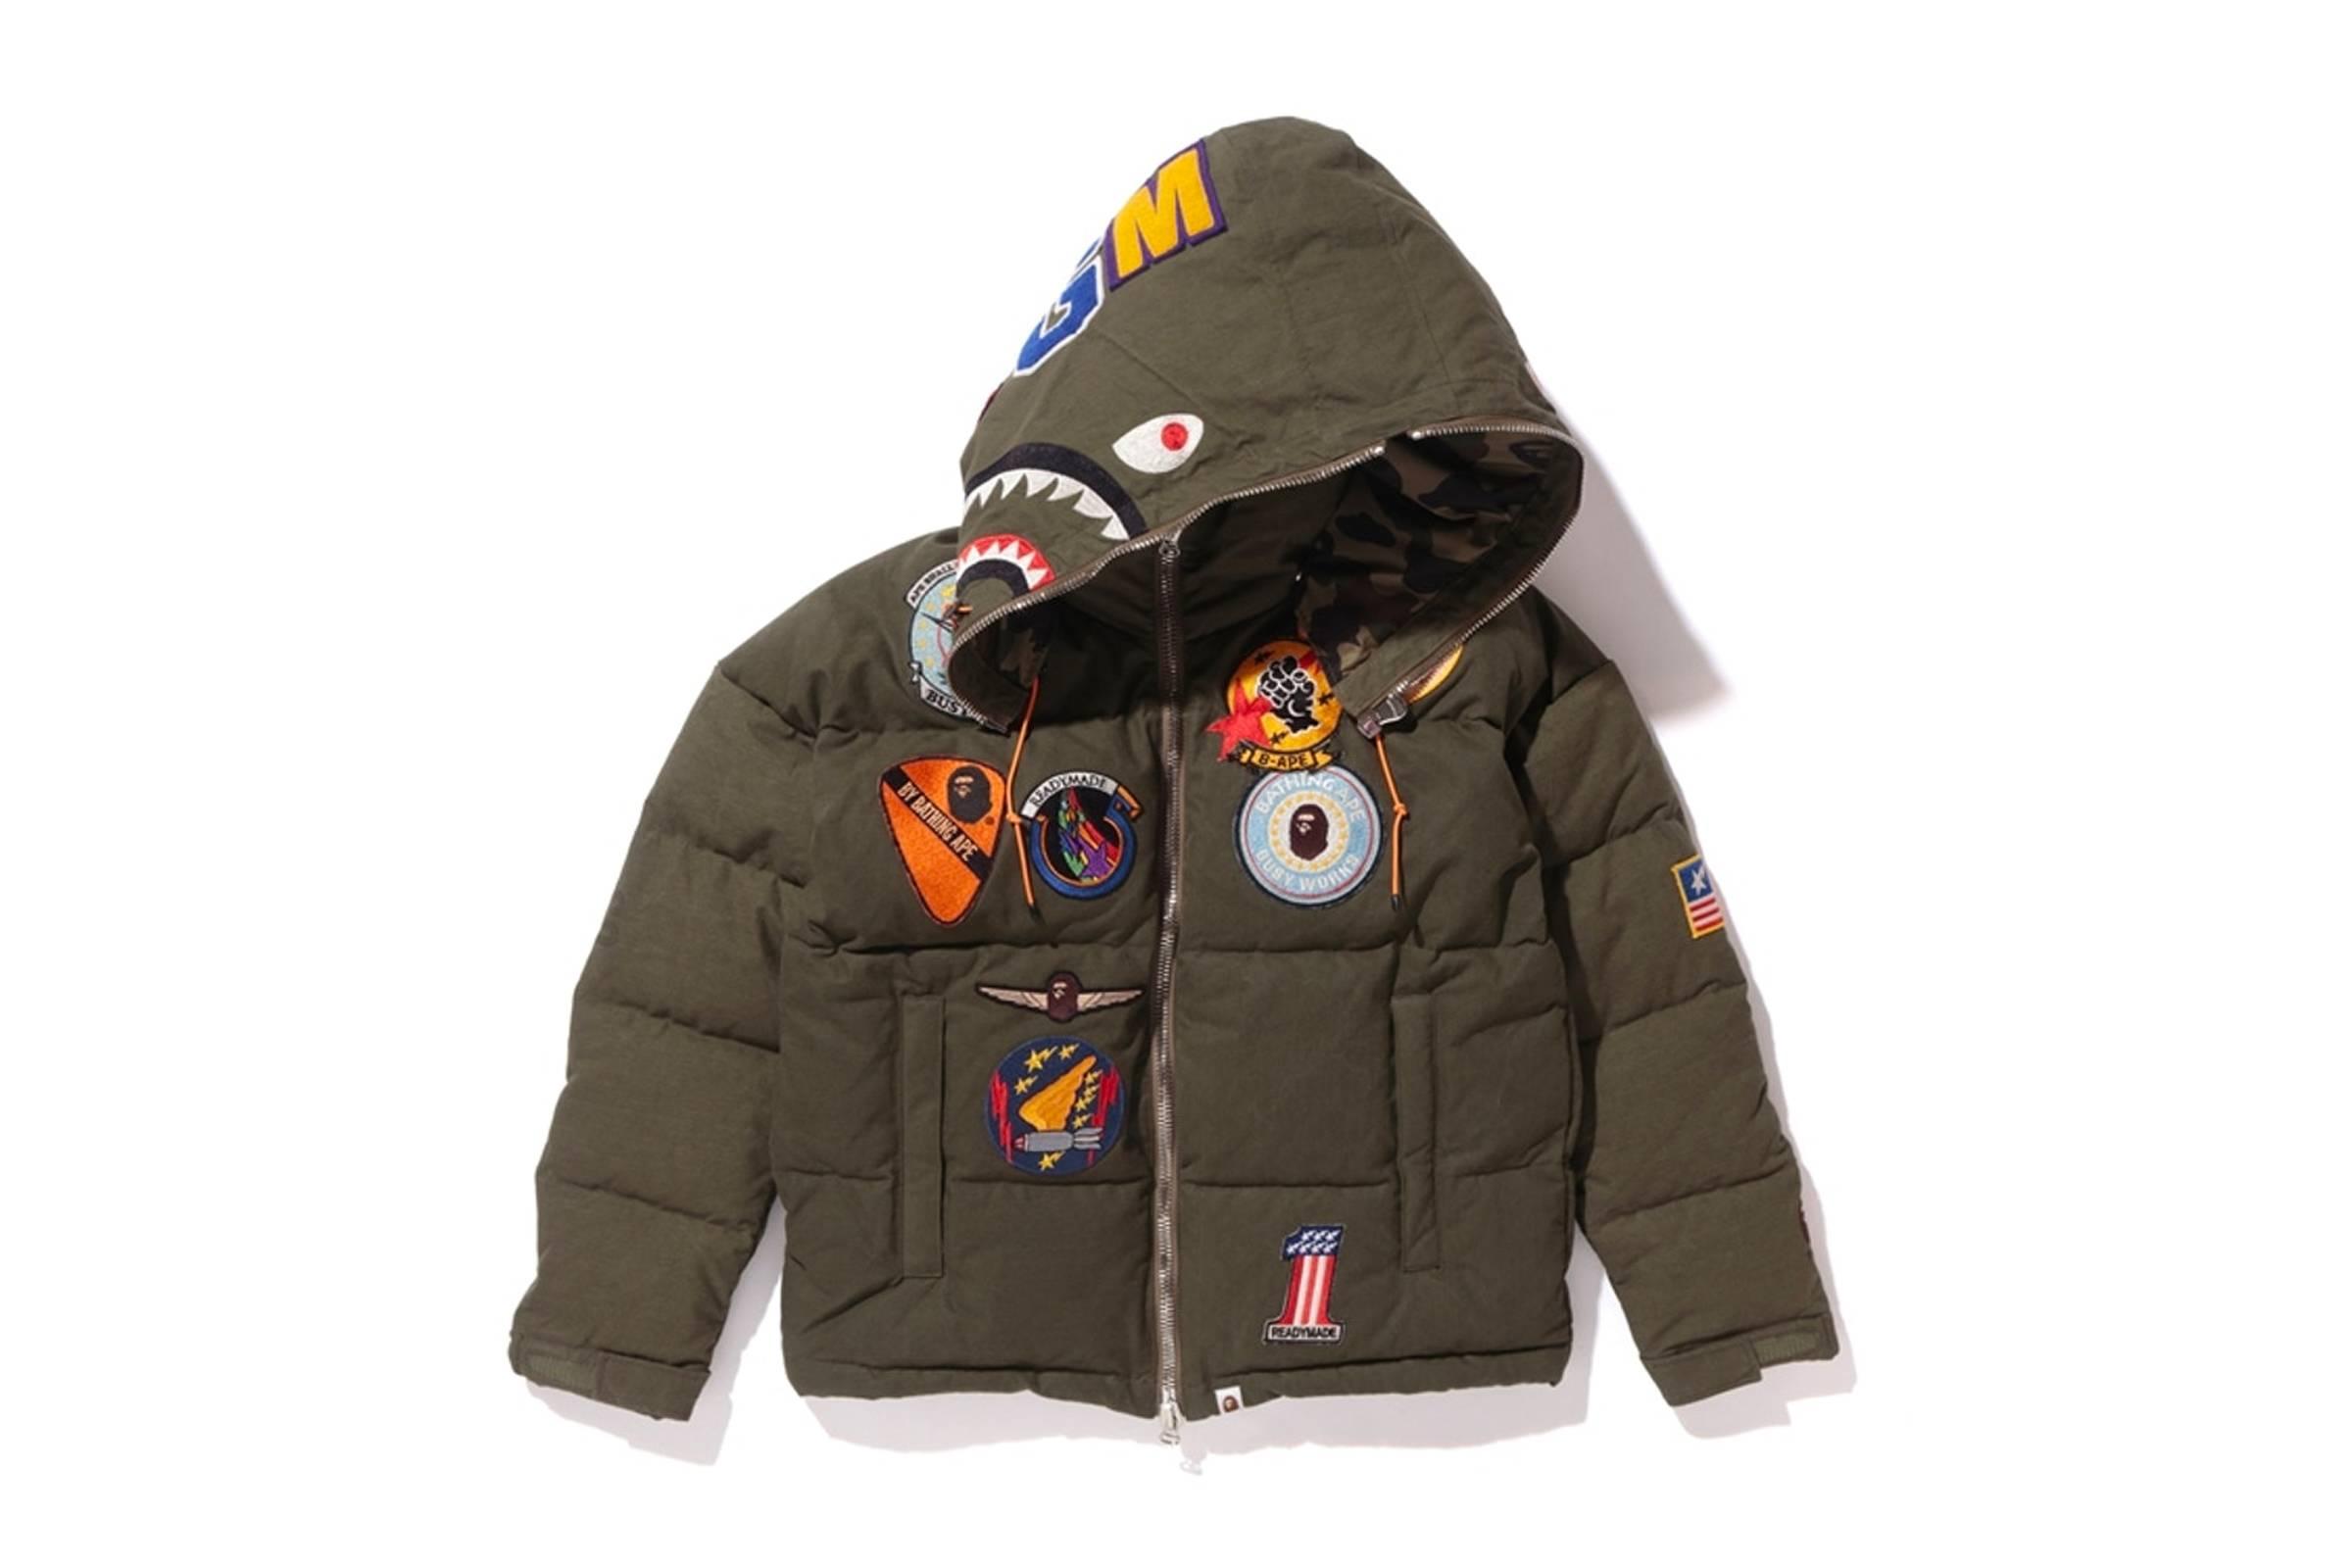 BAPE x READYMADE Down Shark Hooded Puffer Jacket